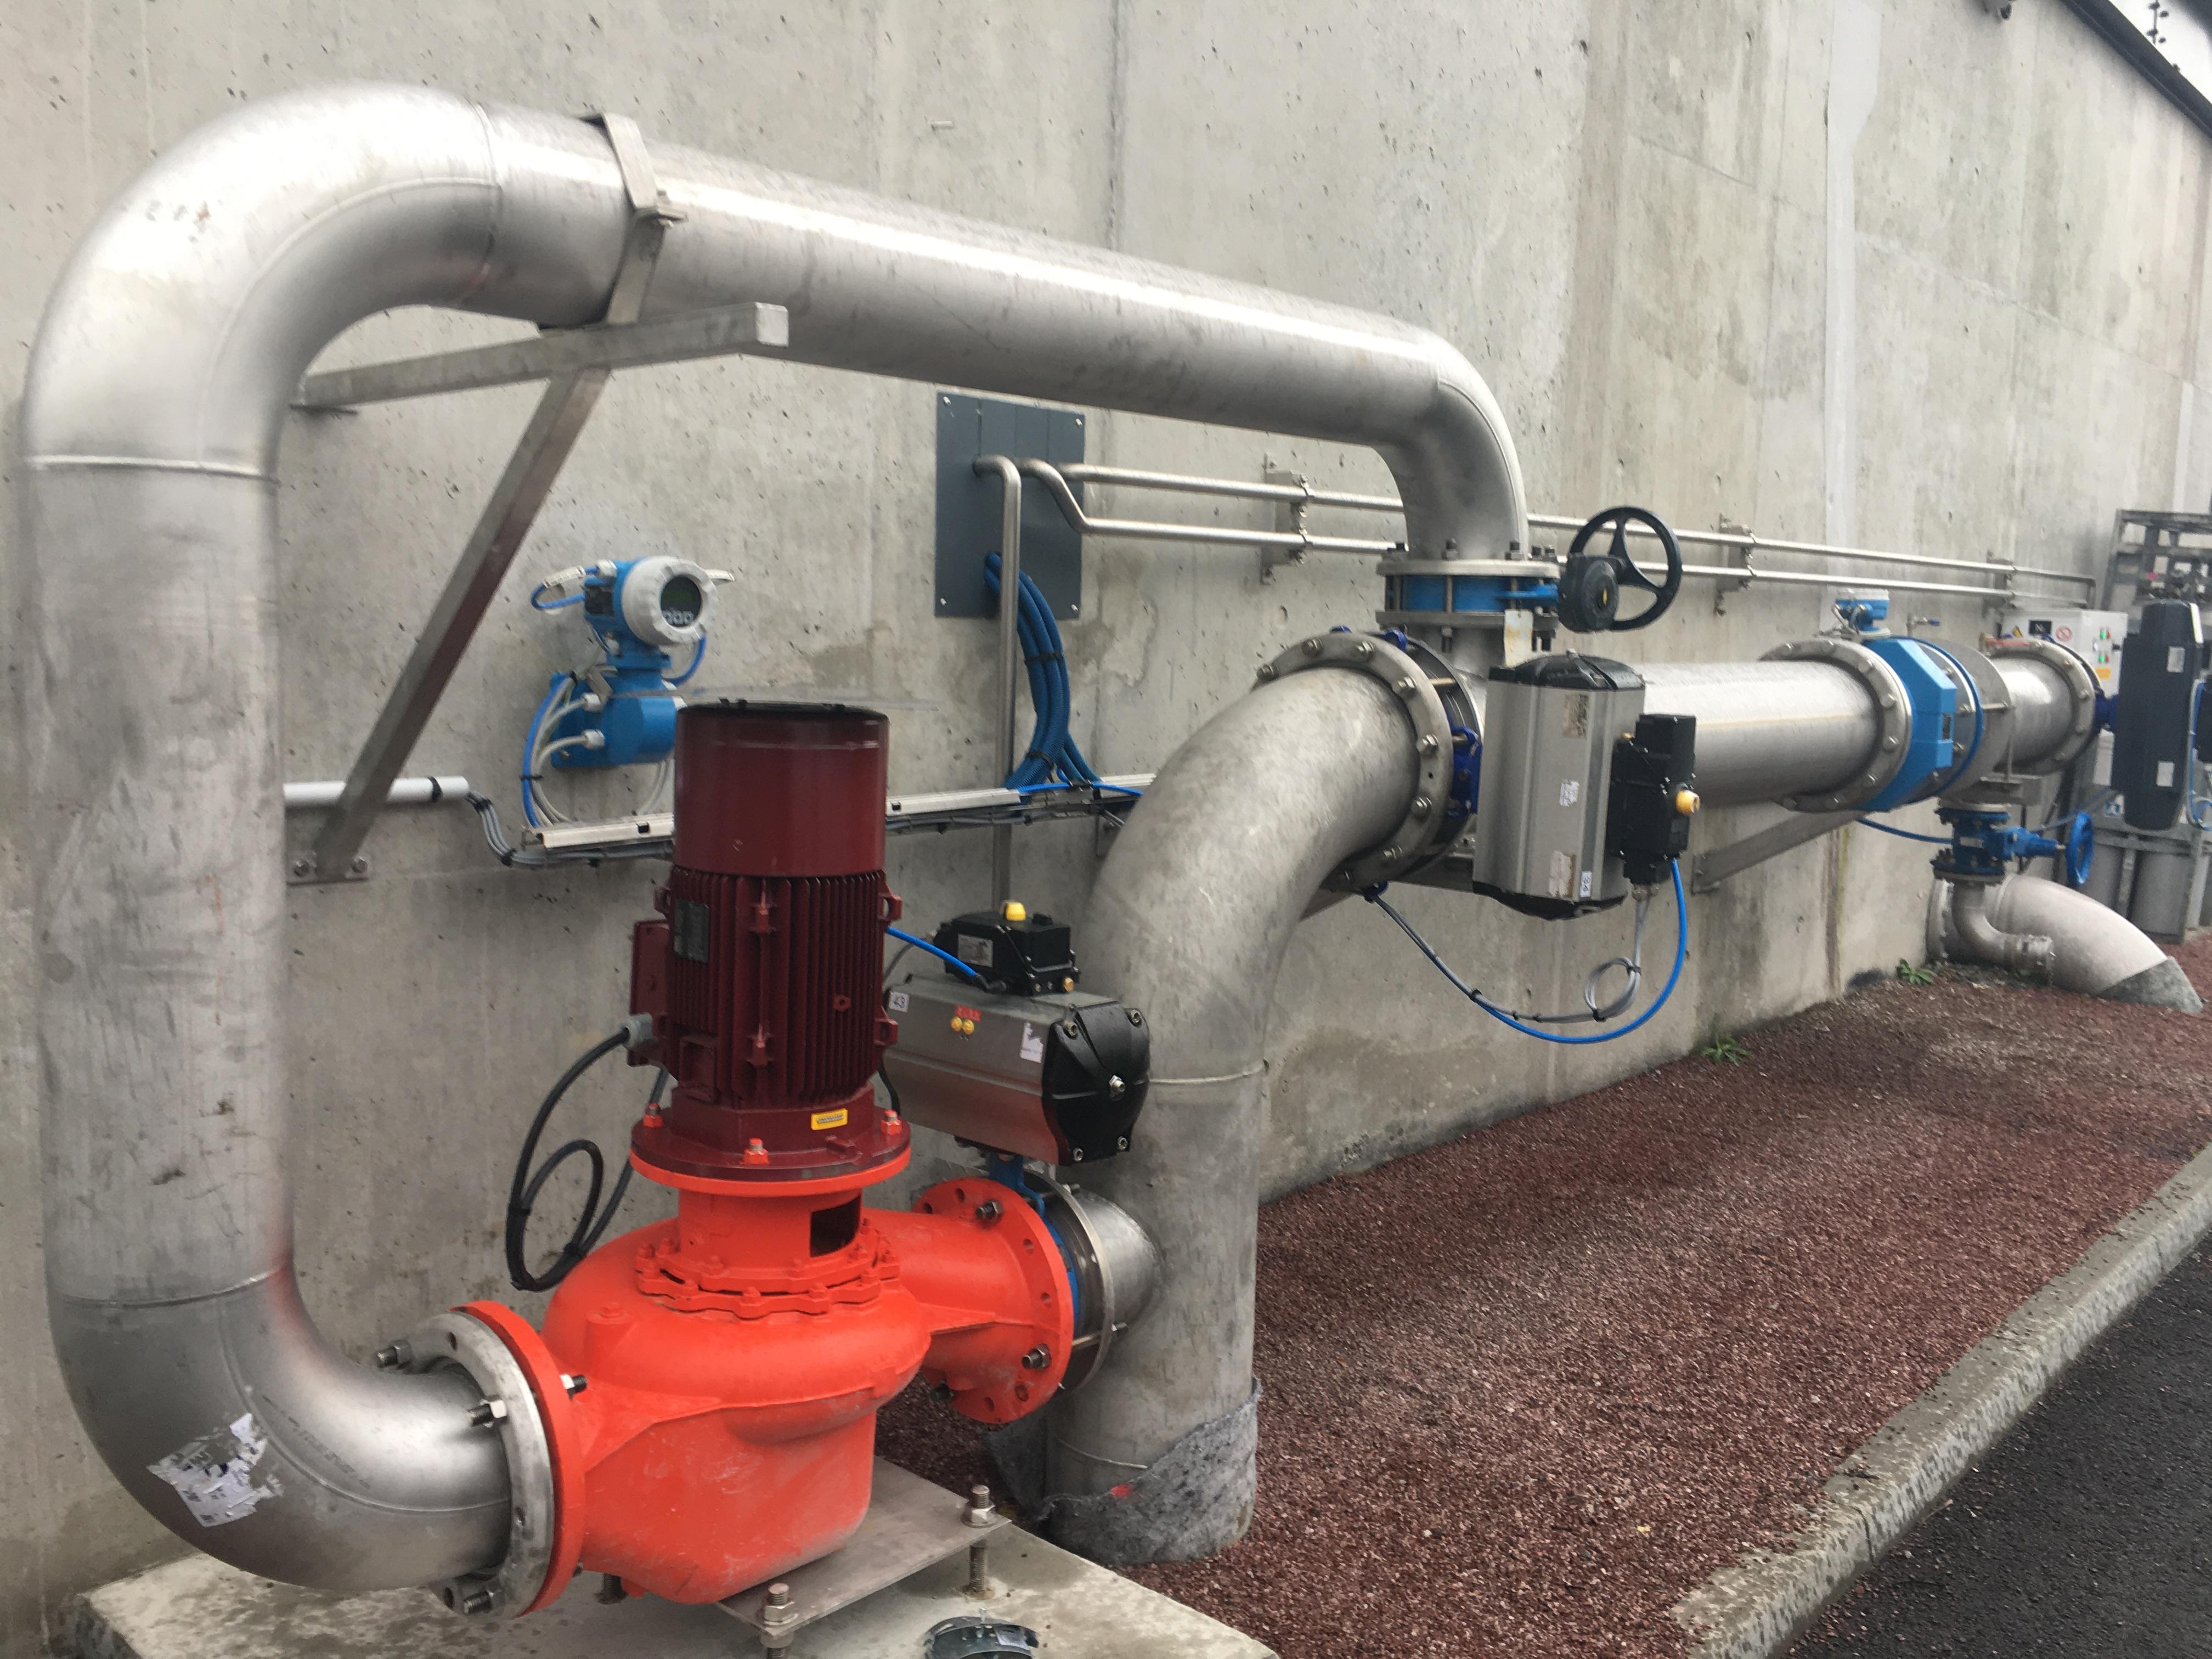 Reverse pump installation at St Pair sur Mer